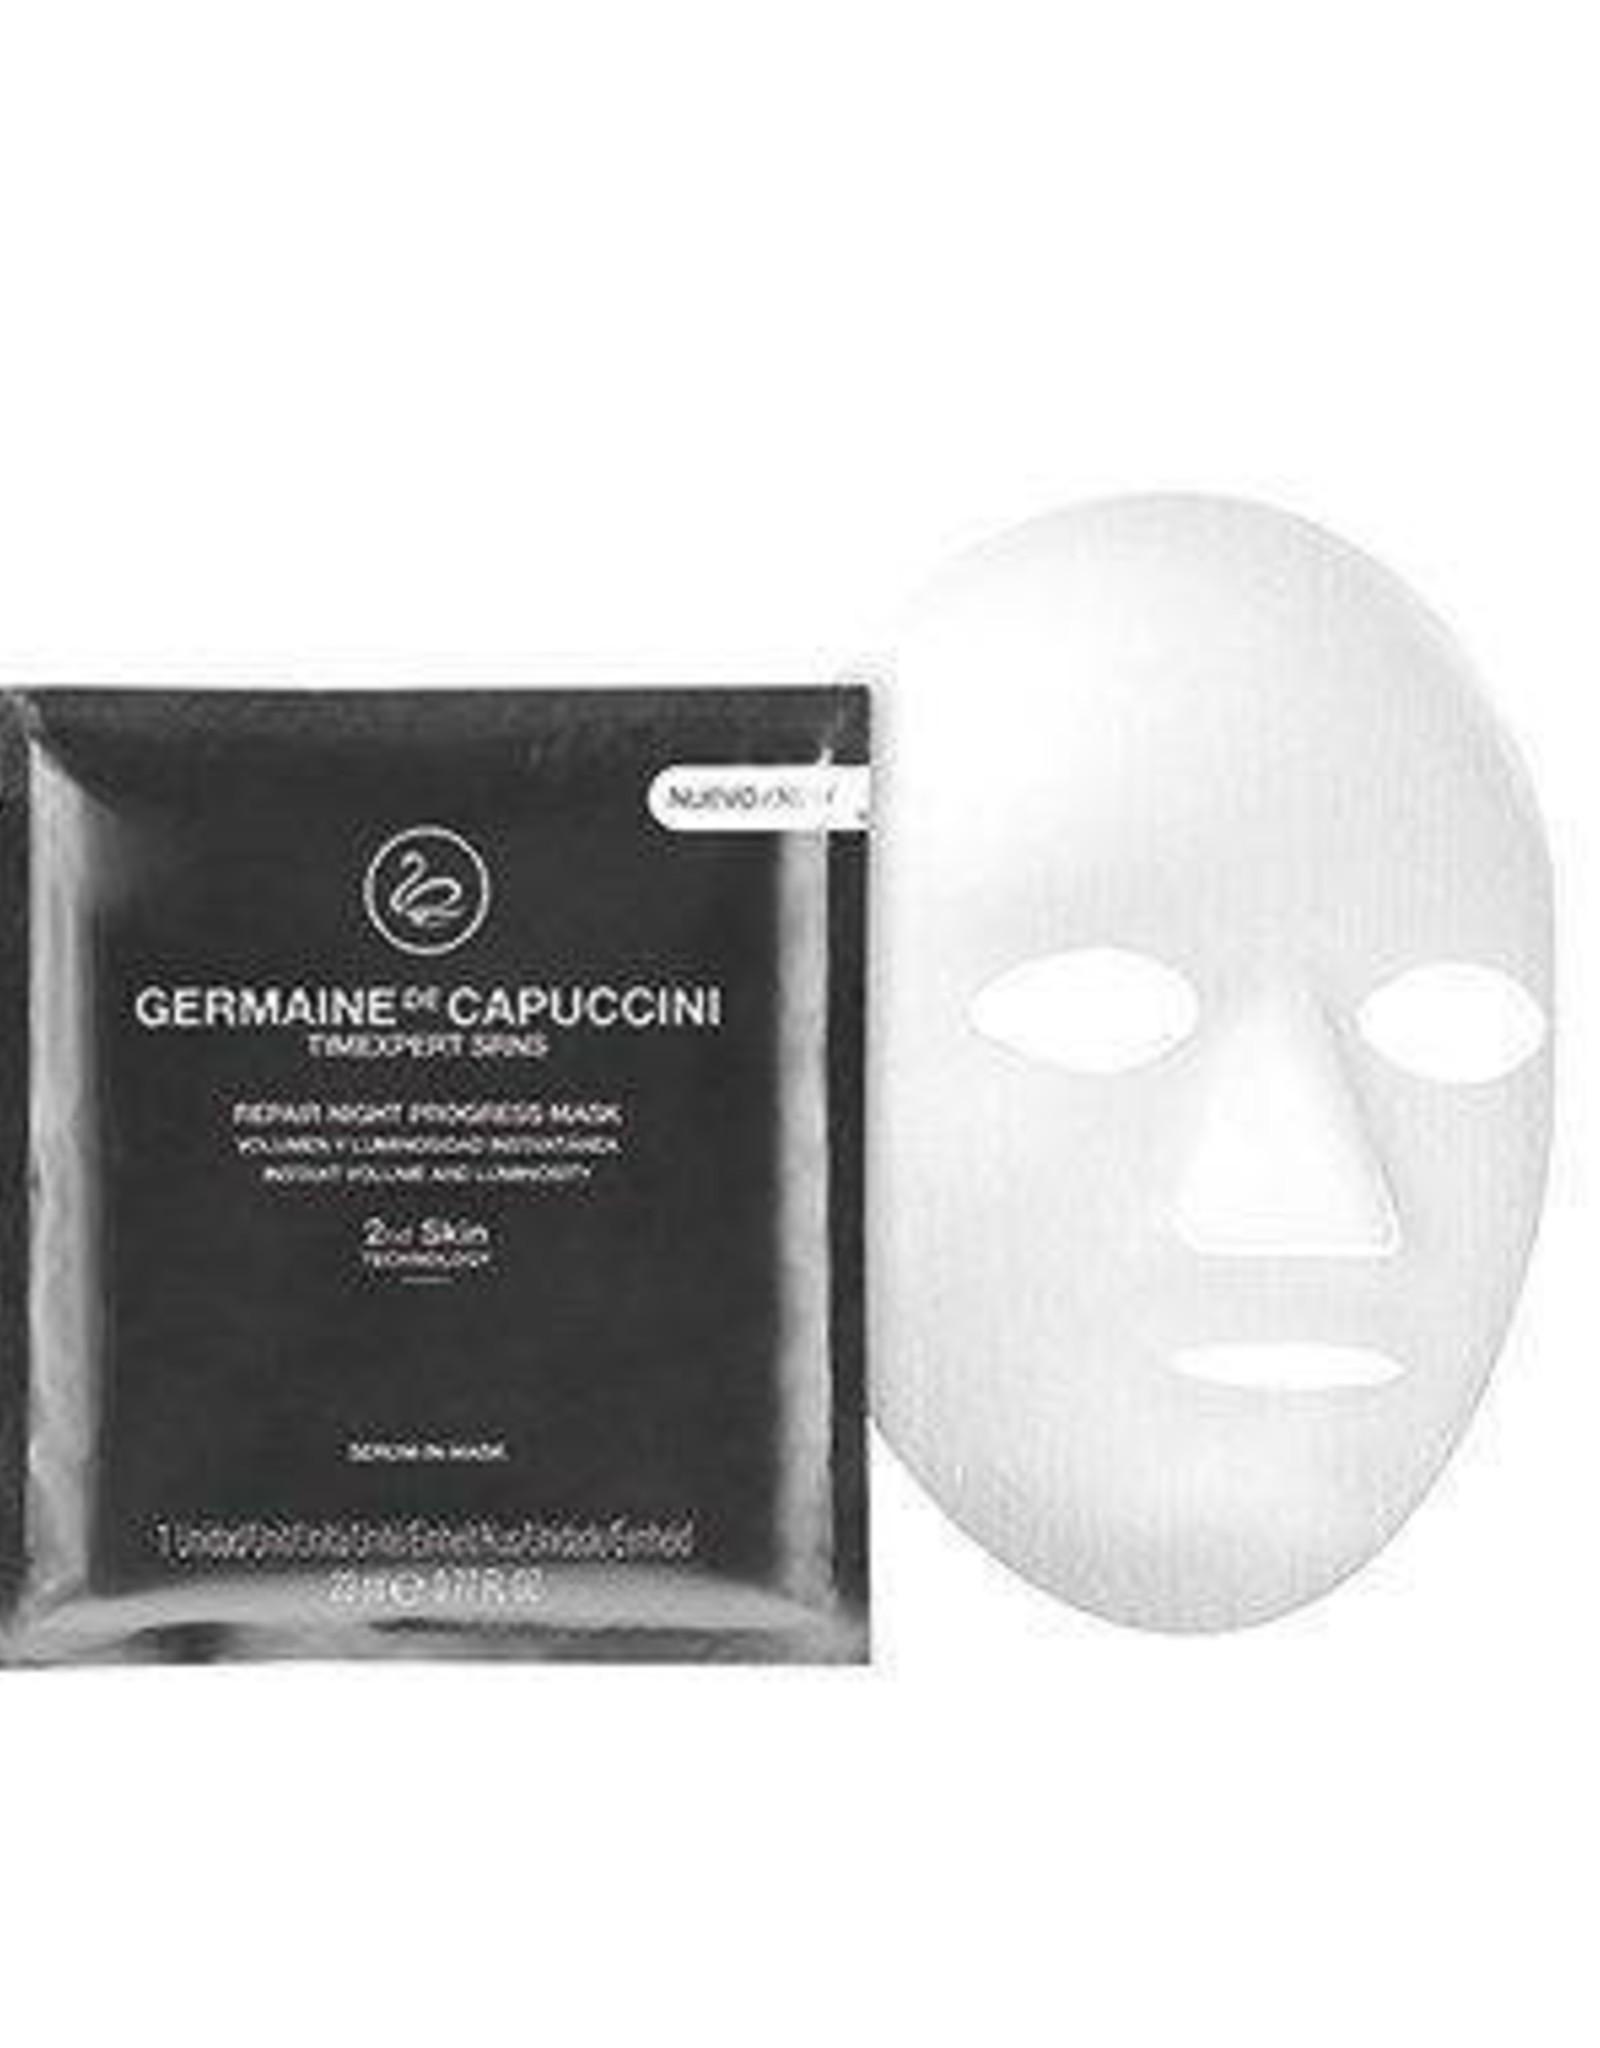 Germaine de Cappucini Timexpert SRNS Repair Night Progress mask